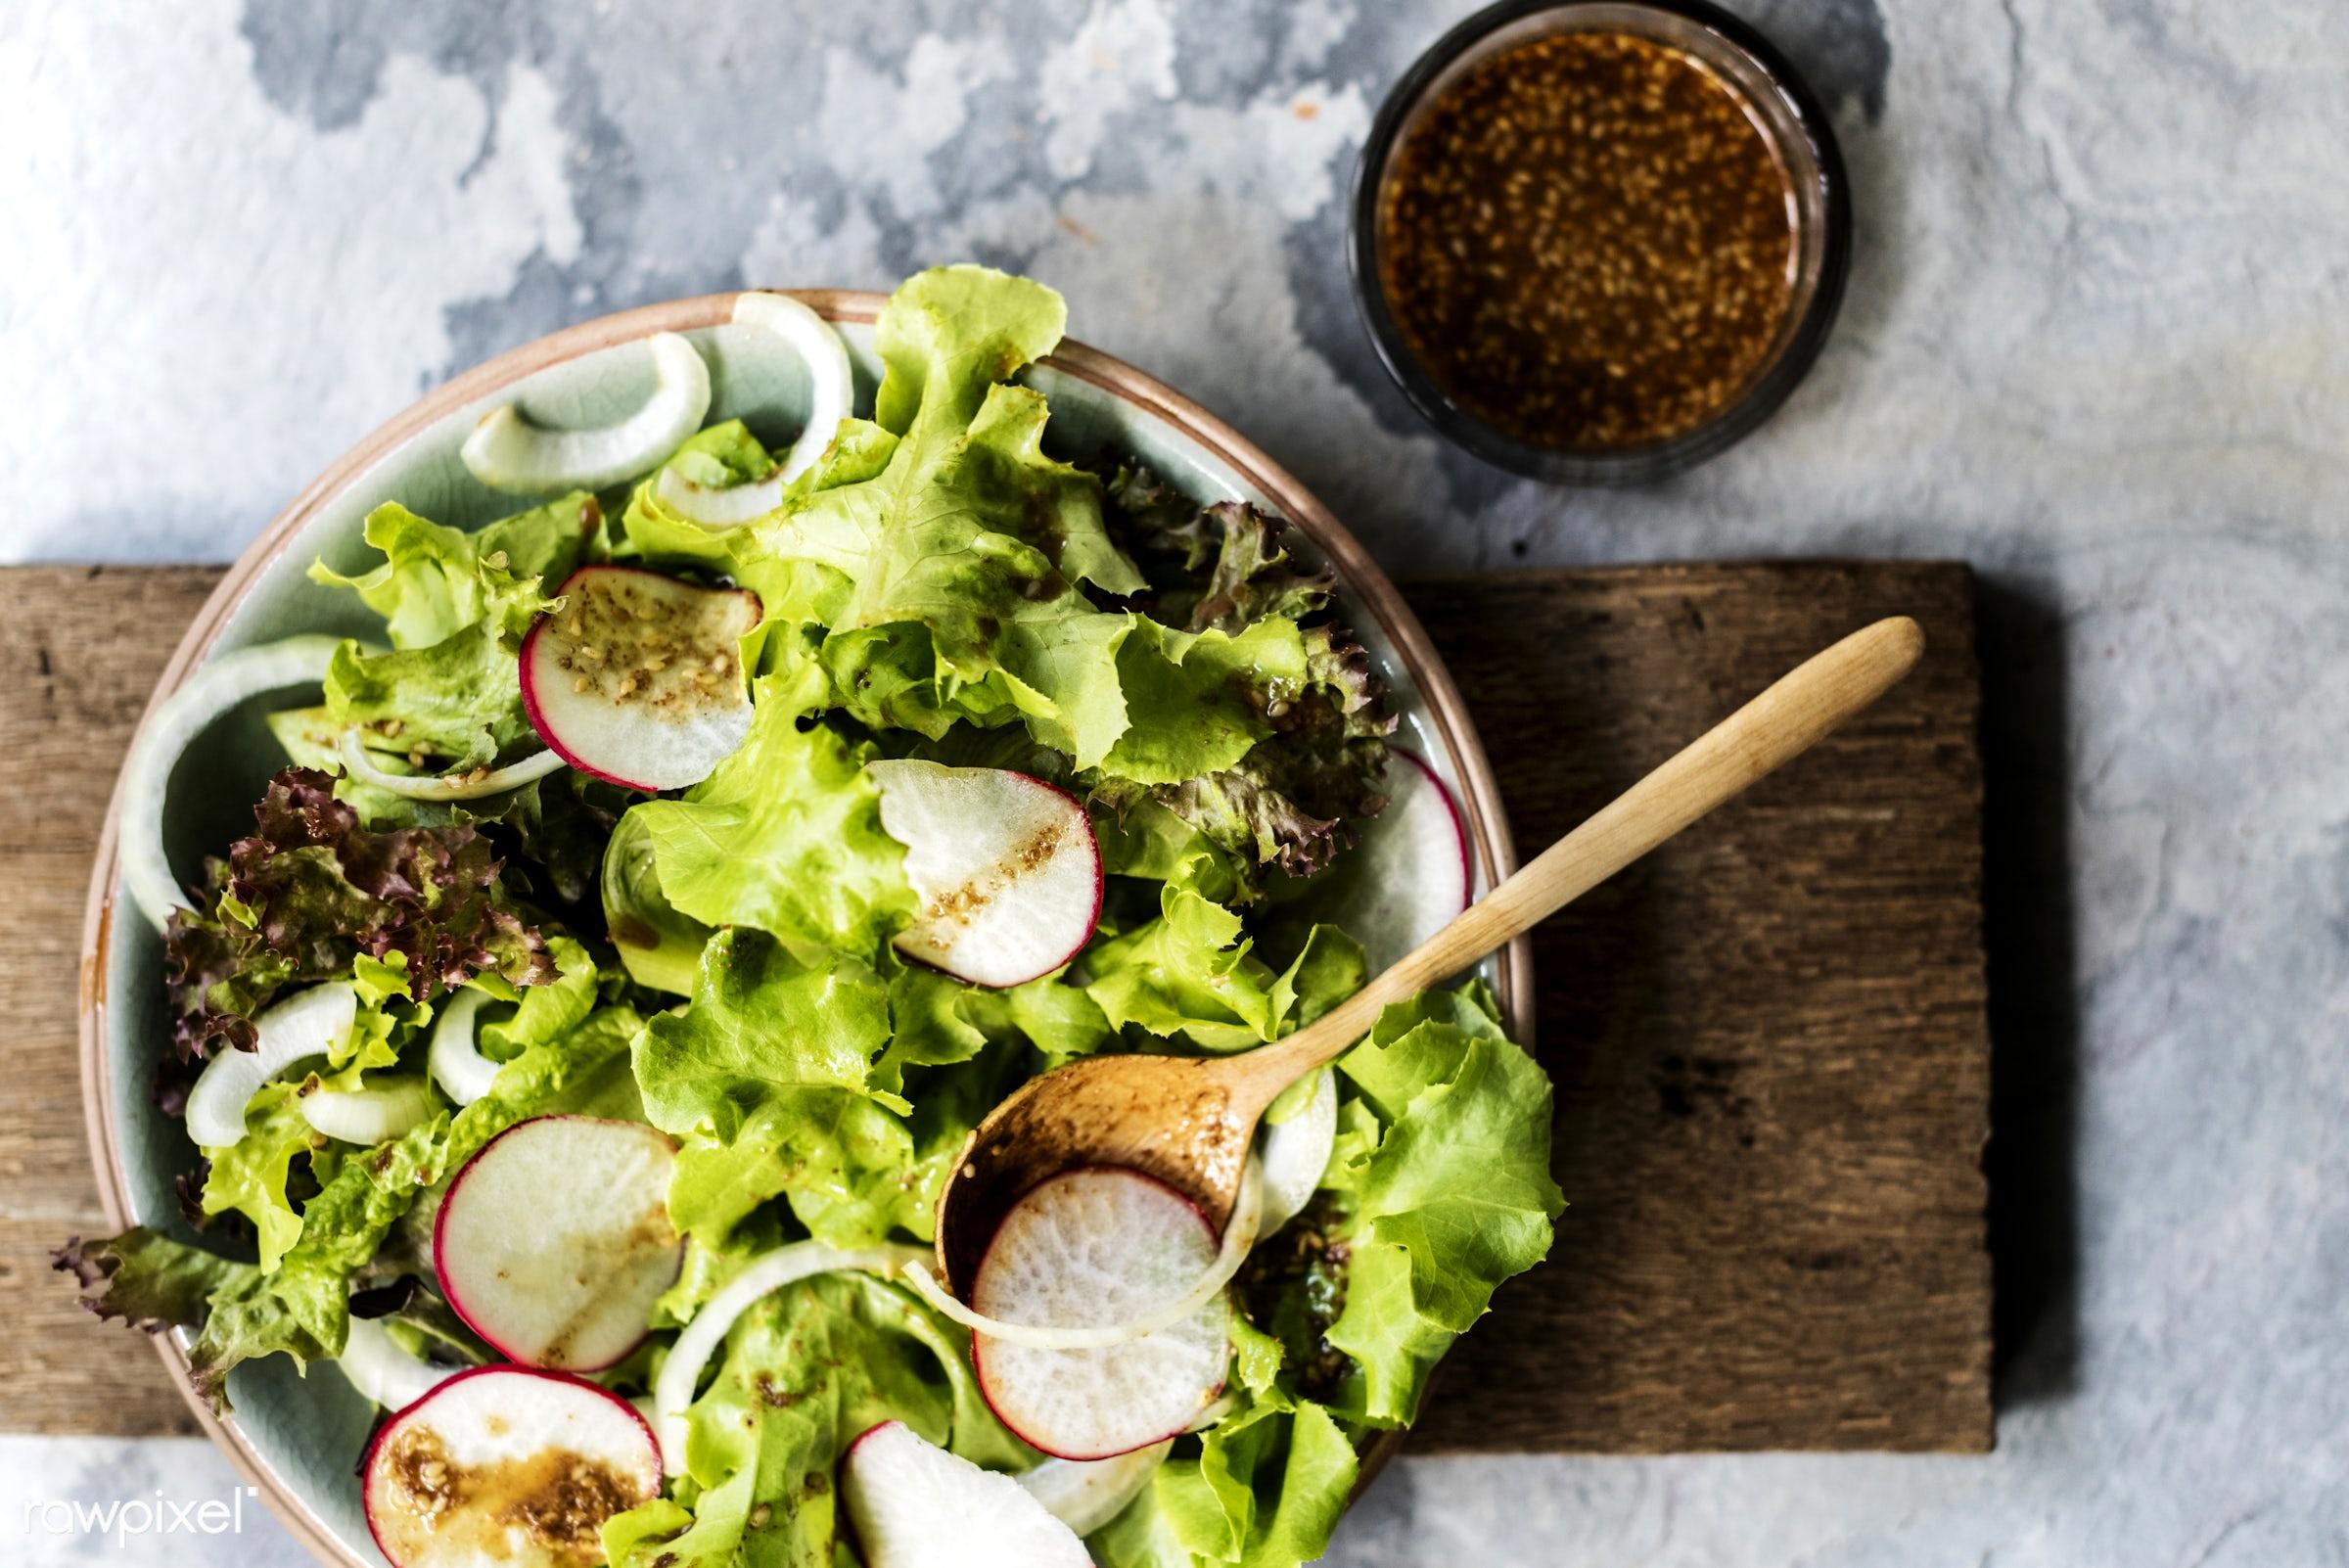 raw, salad, salad dressing, gastronomy, fresh, ingredient, cooking, vegetarian, gourmet, nourishment, cutting board,...